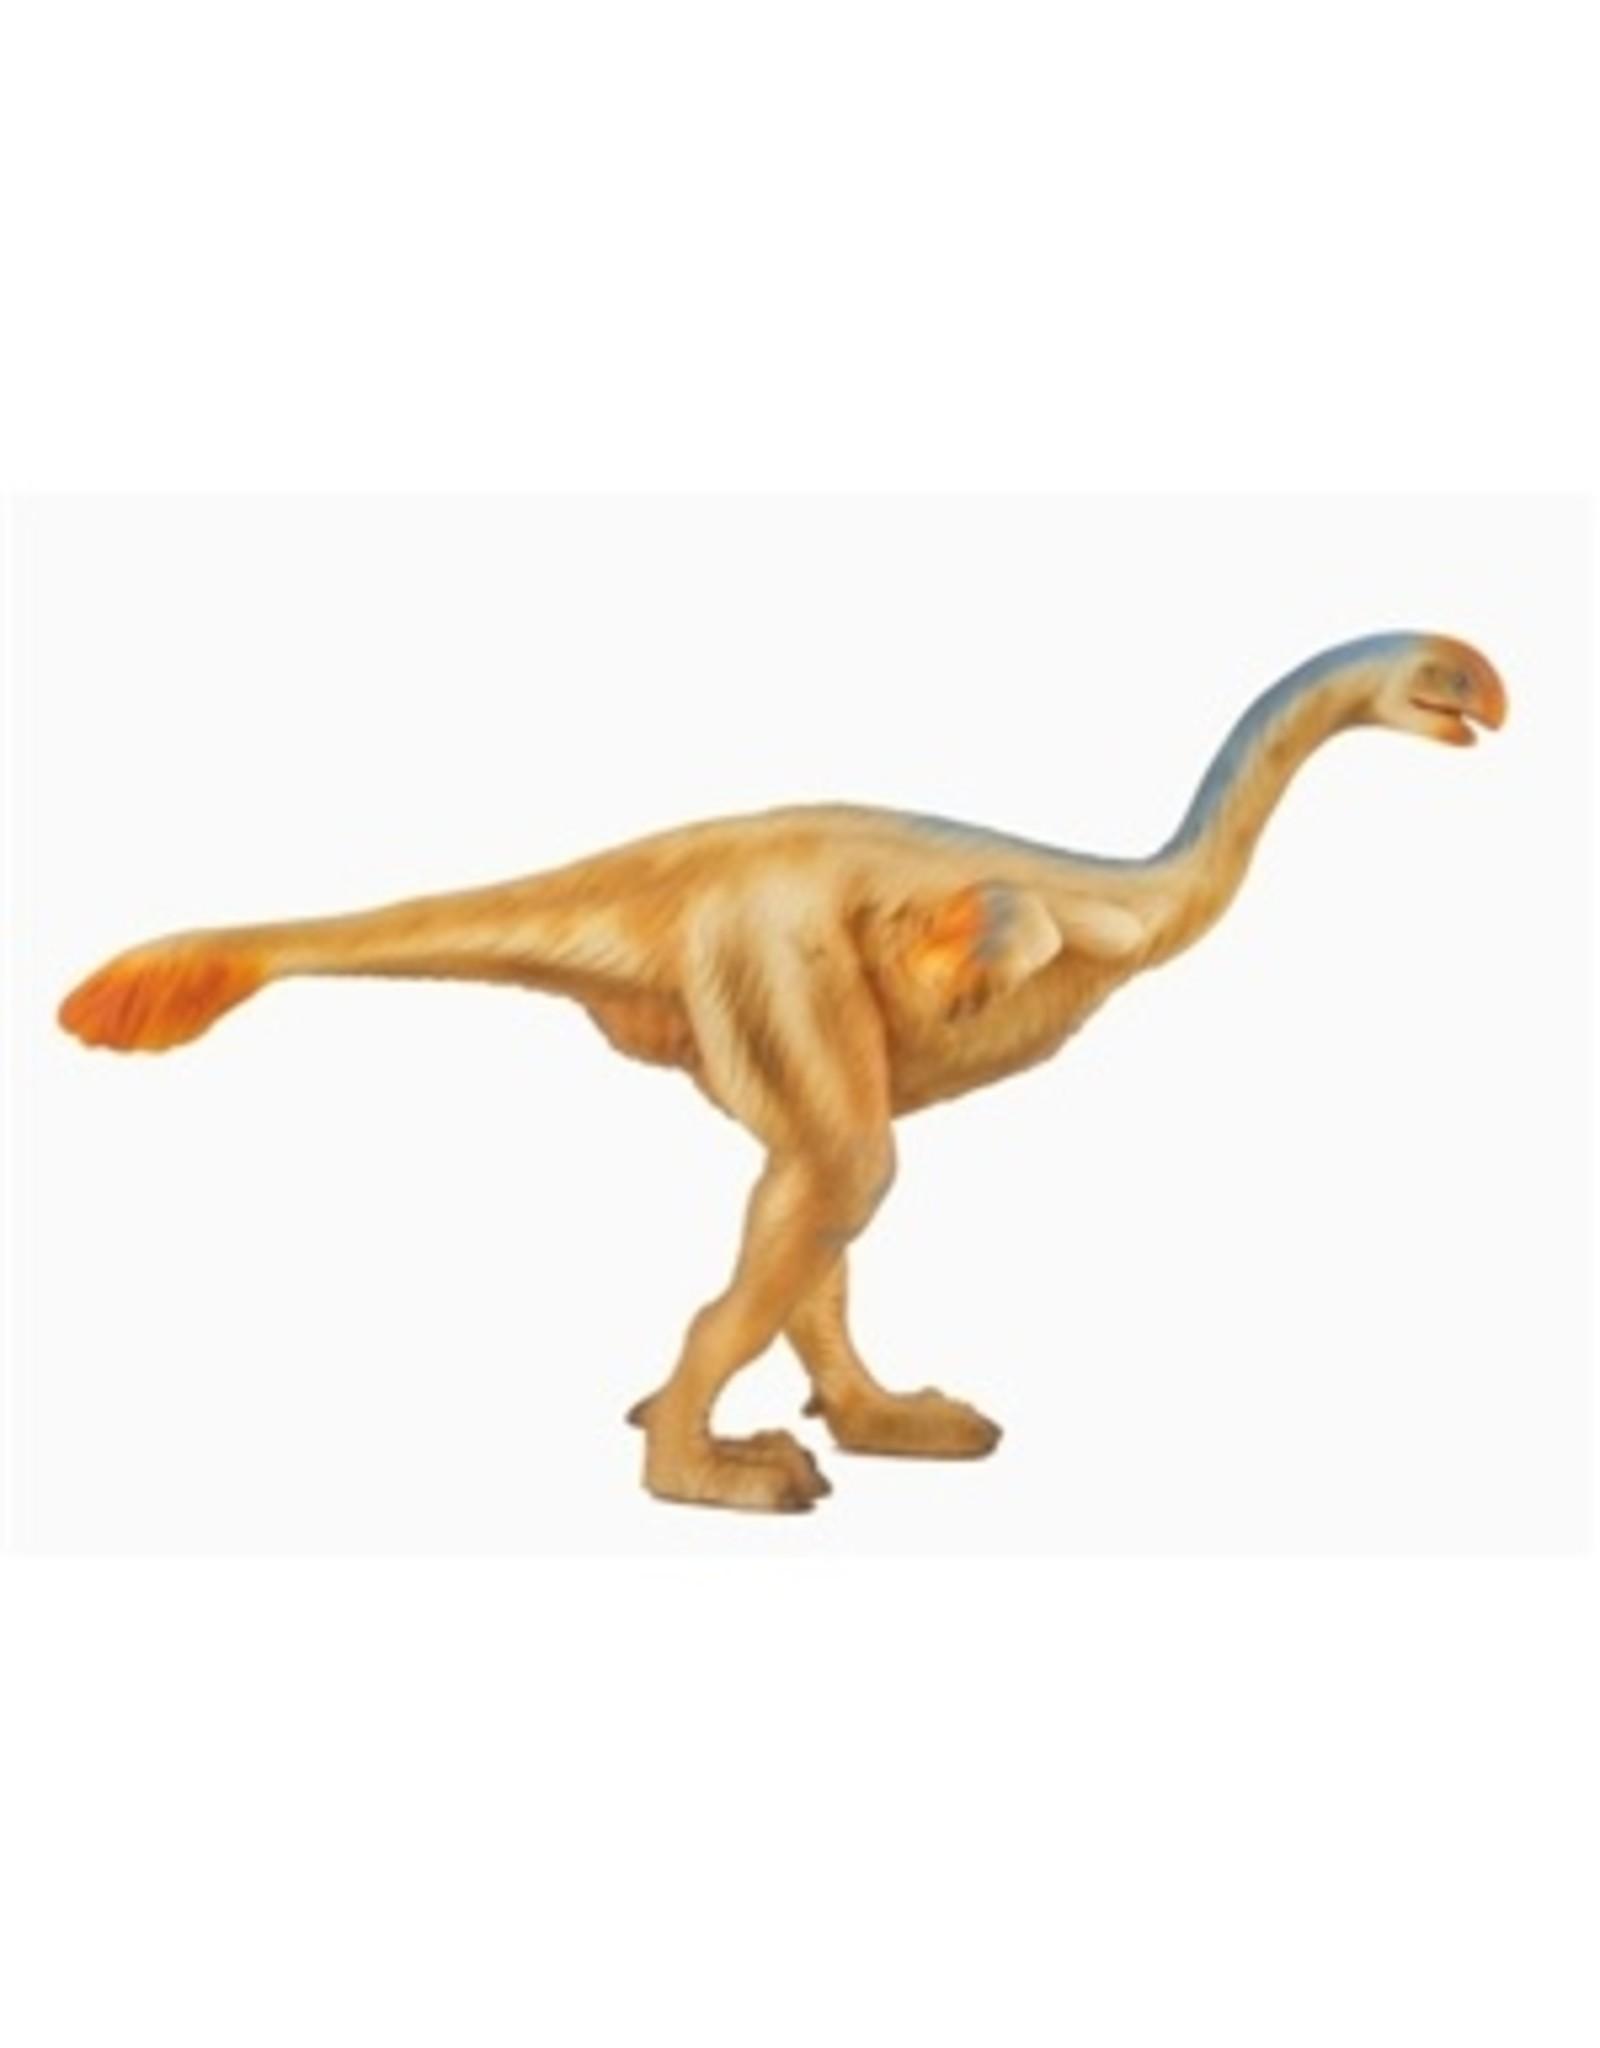 Giantoraptor